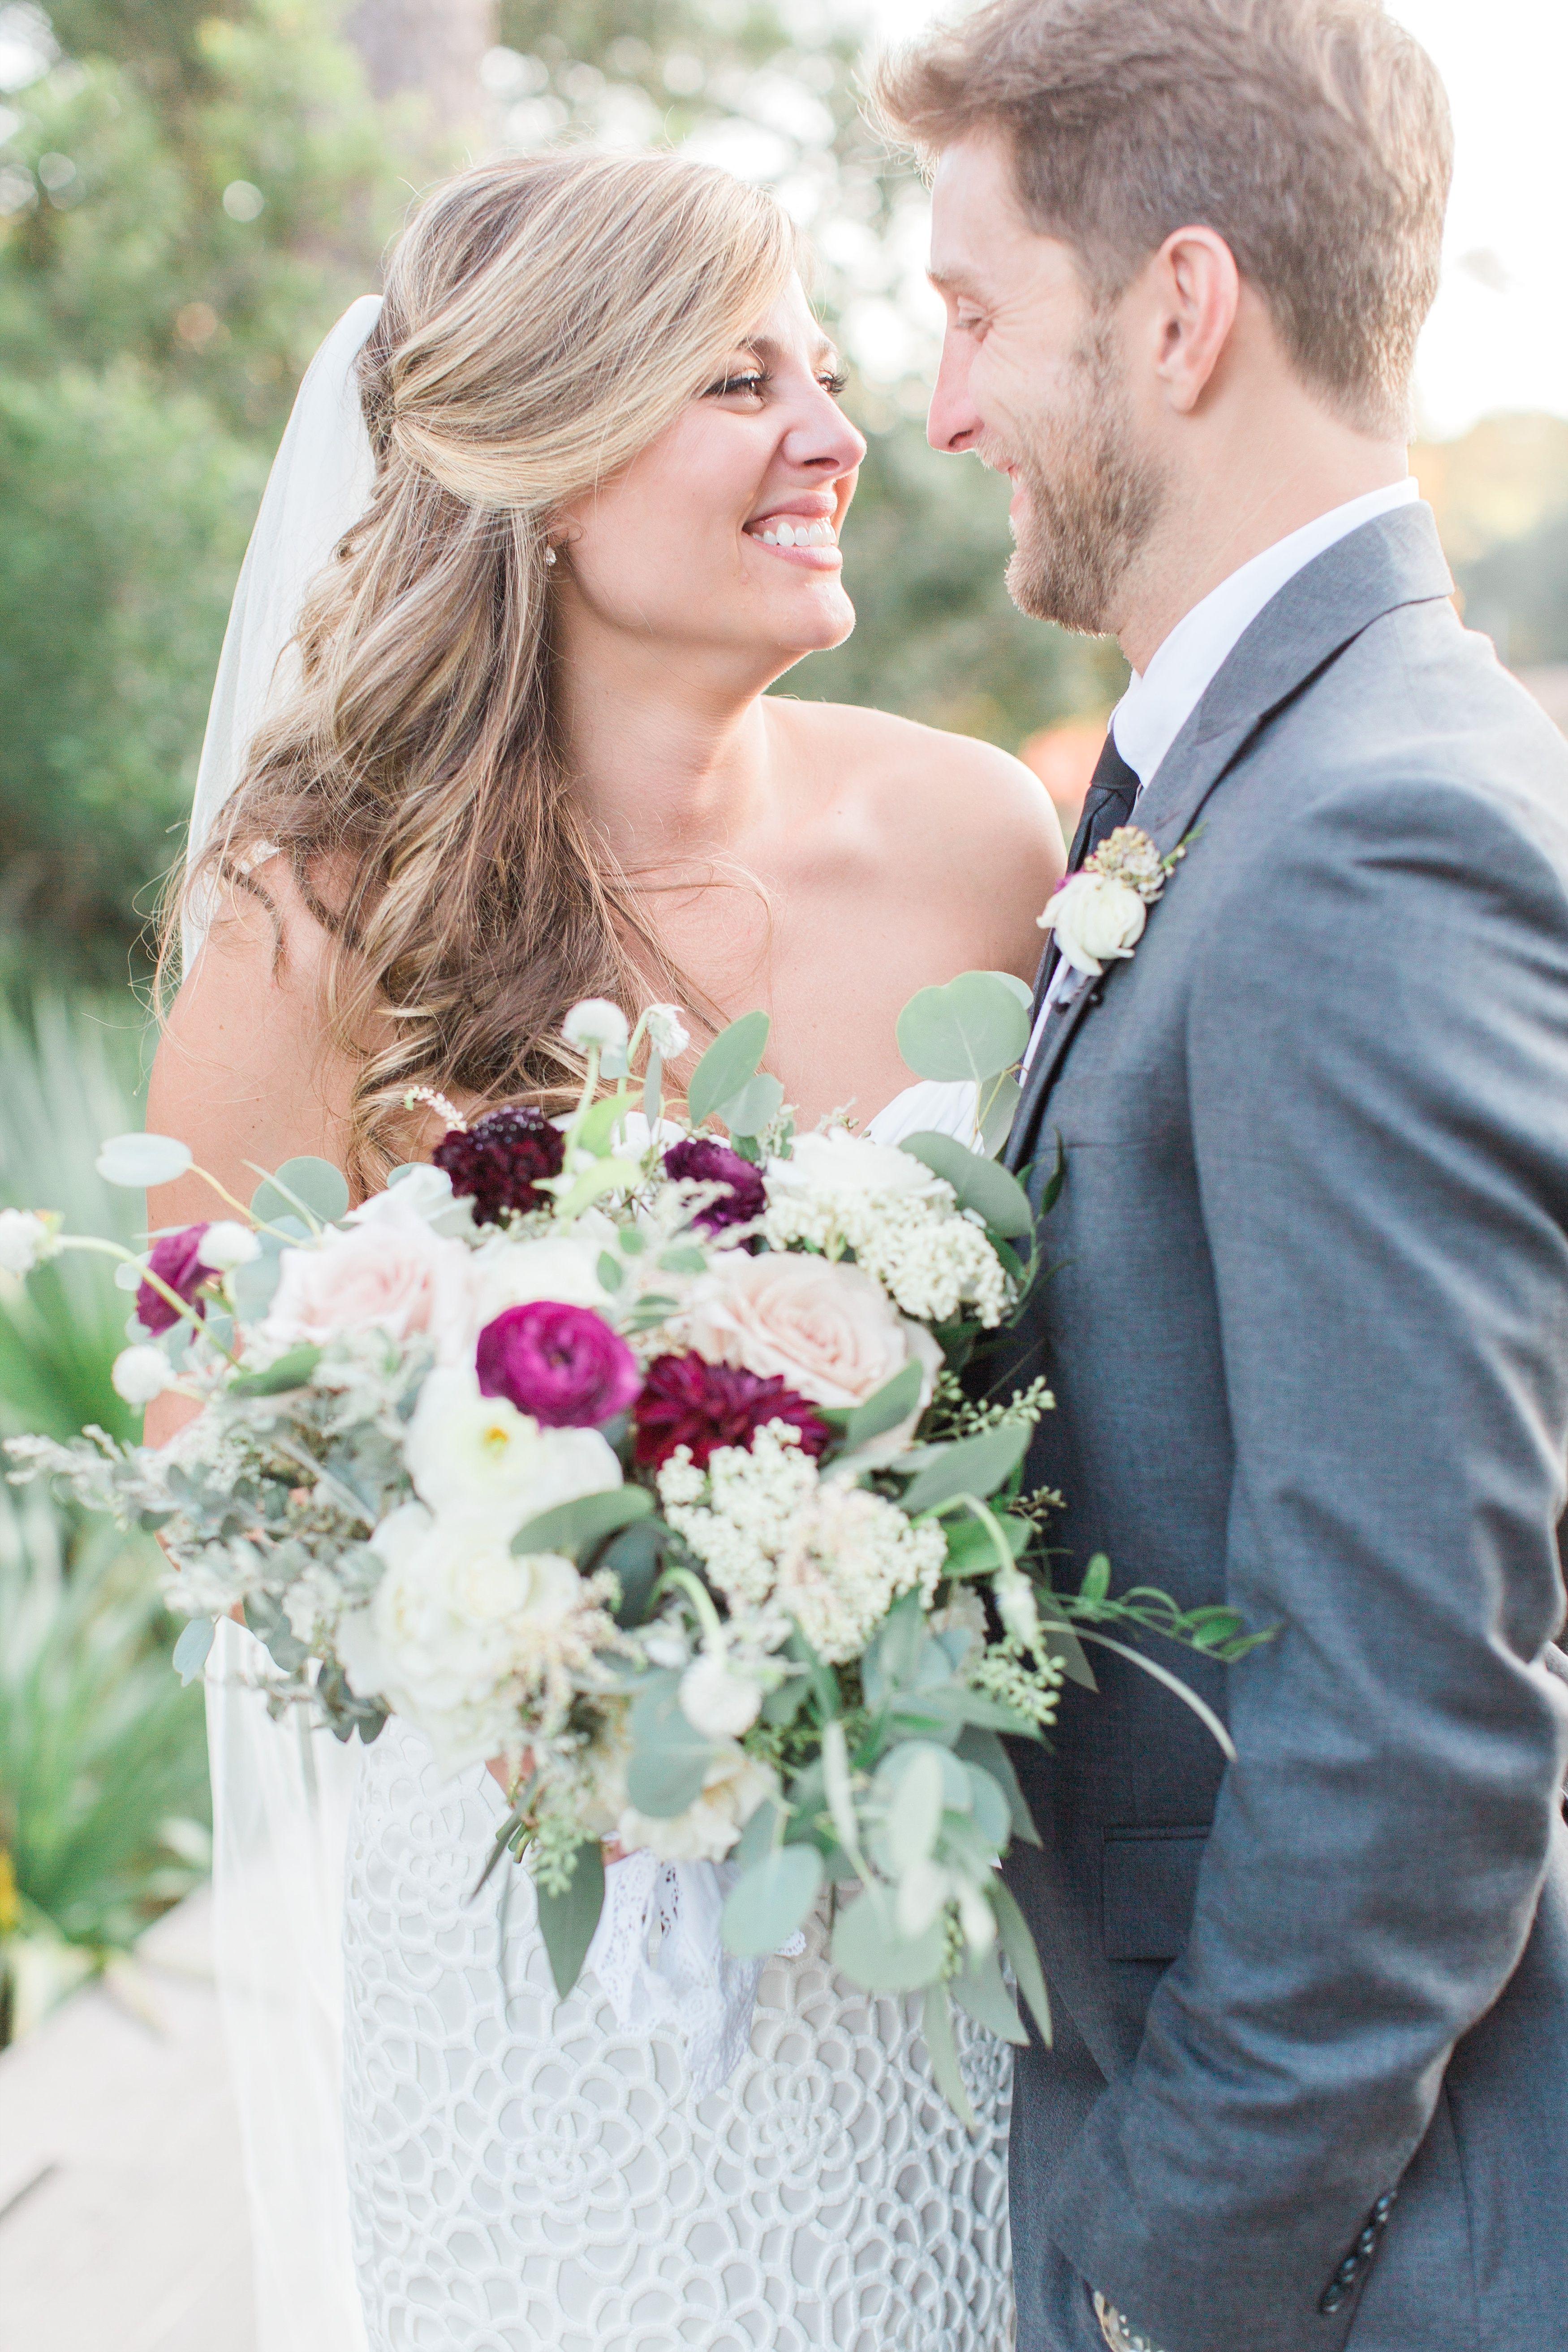 Wedding decorations with lights november 2018 Pin by Hailey Patrick on November   Pinterest  Hall Wedding